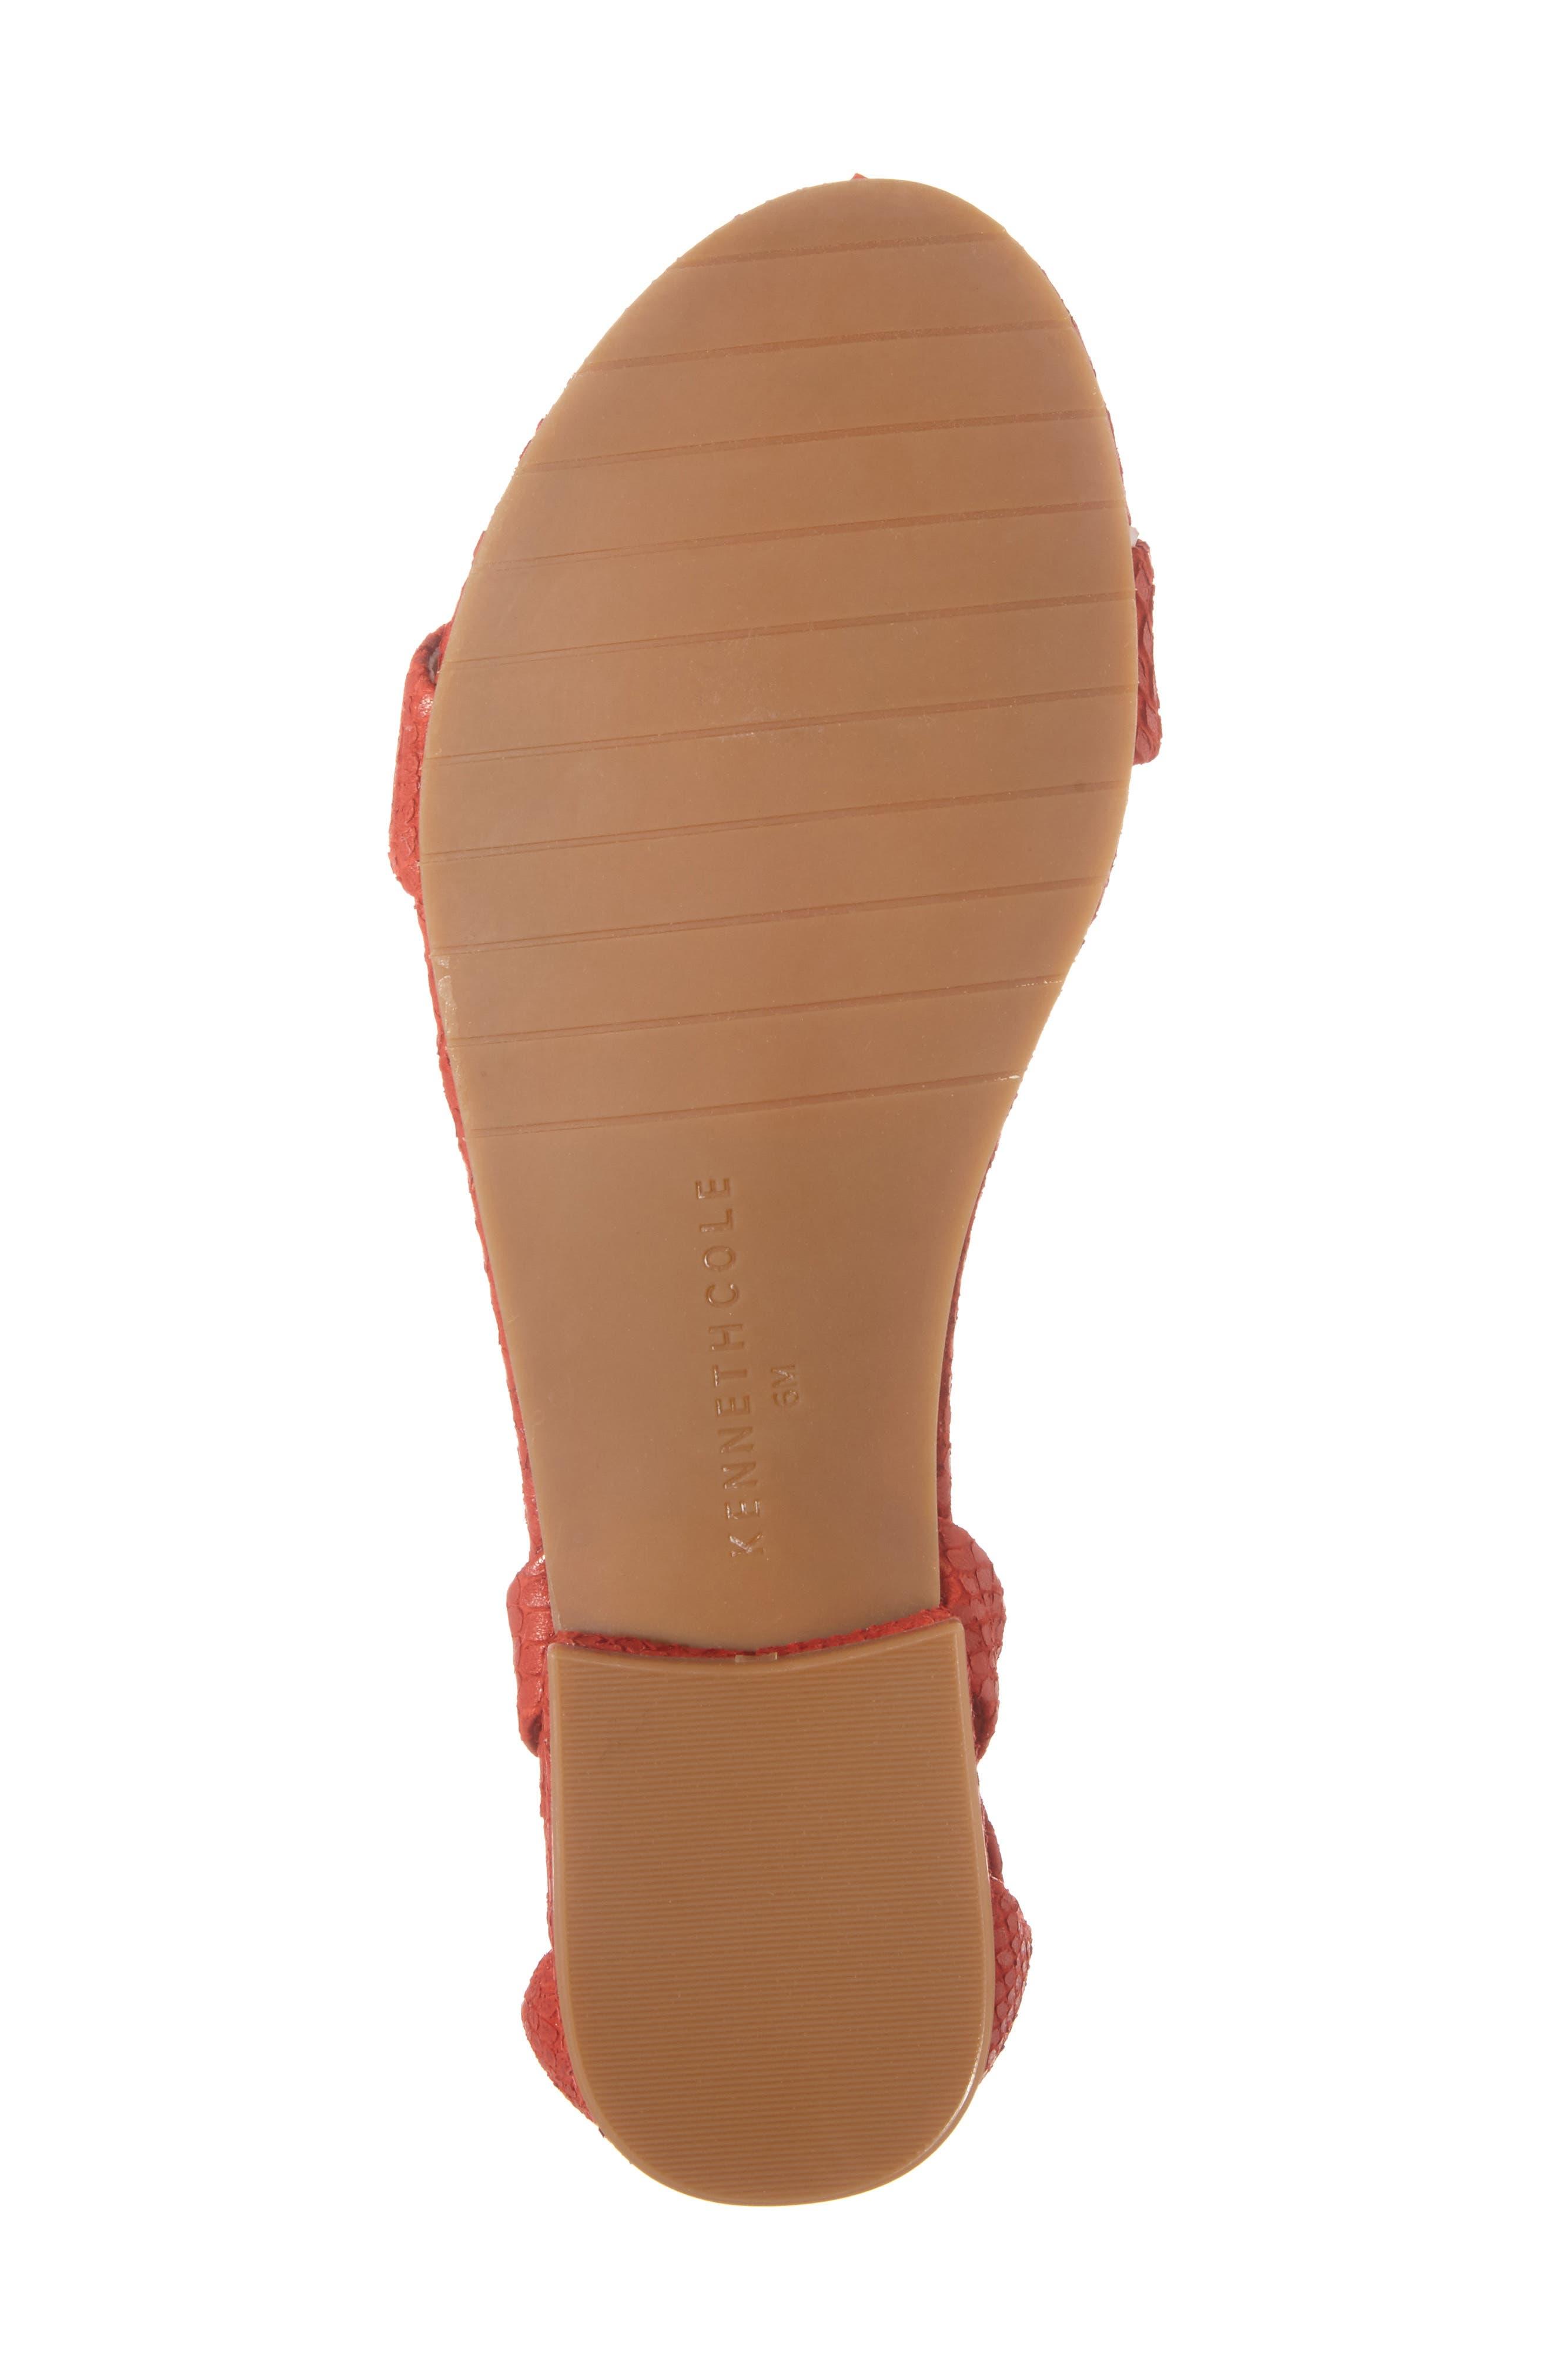 Valen Tassel Lace-Up Sandal,                             Alternate thumbnail 66, color,